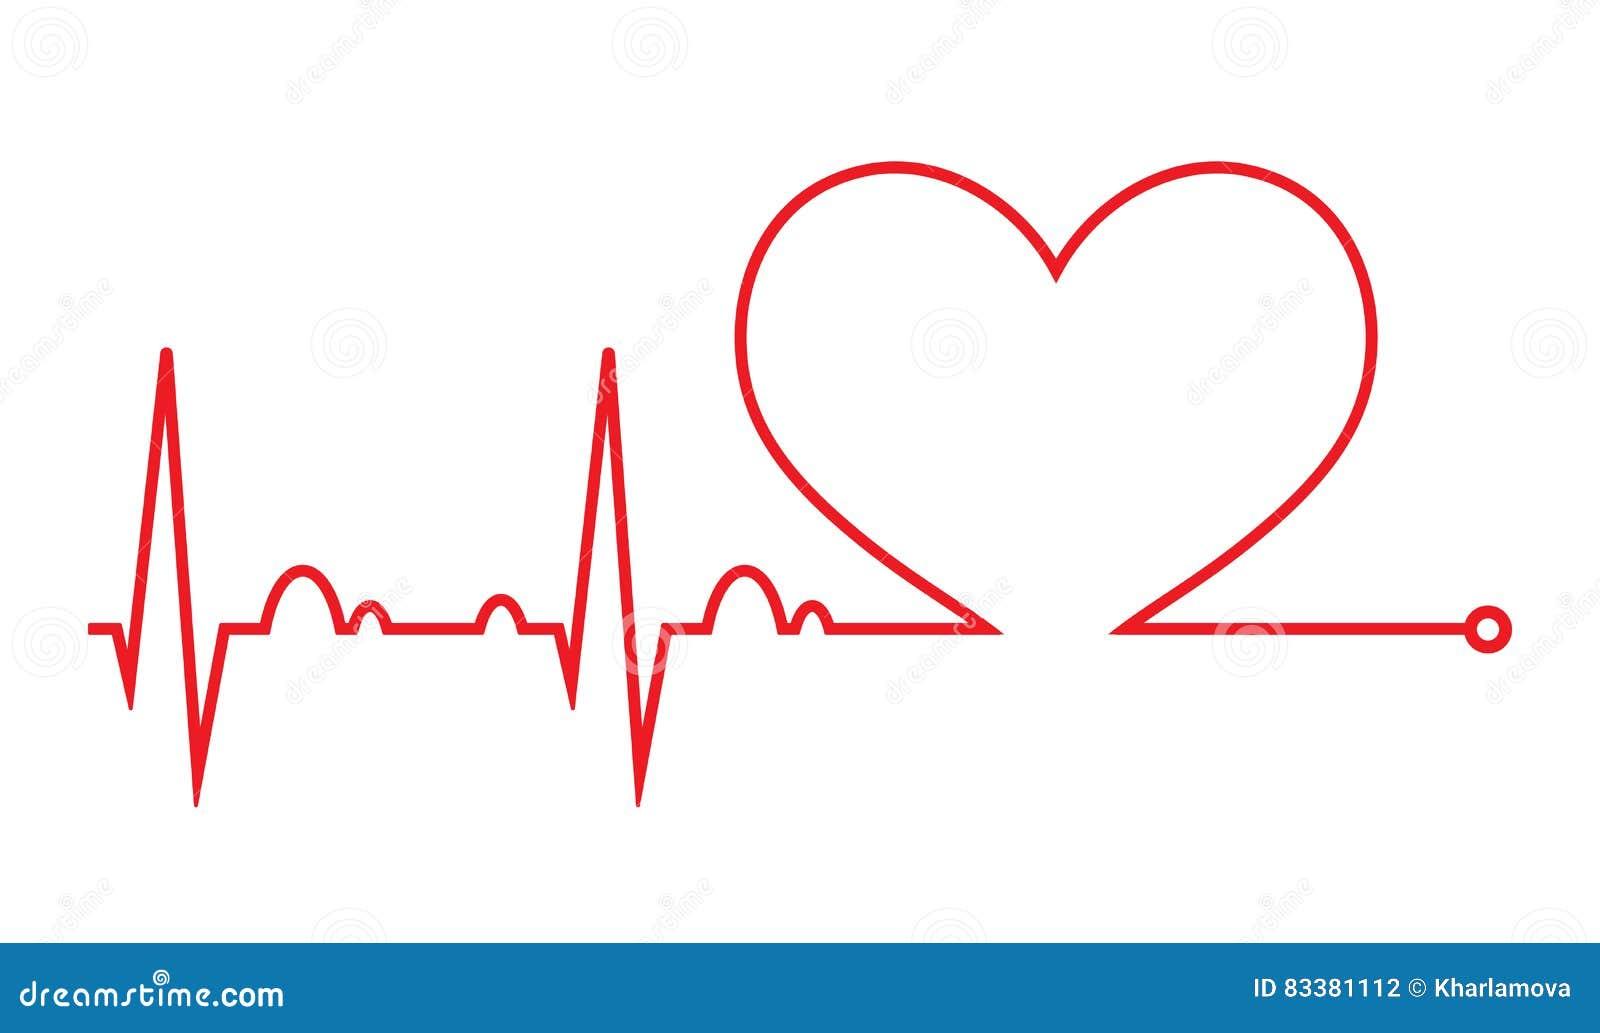 Heart beat cardiogram cardiac cycle medical icon stock vector cardiac cycle medical icon pooptronica